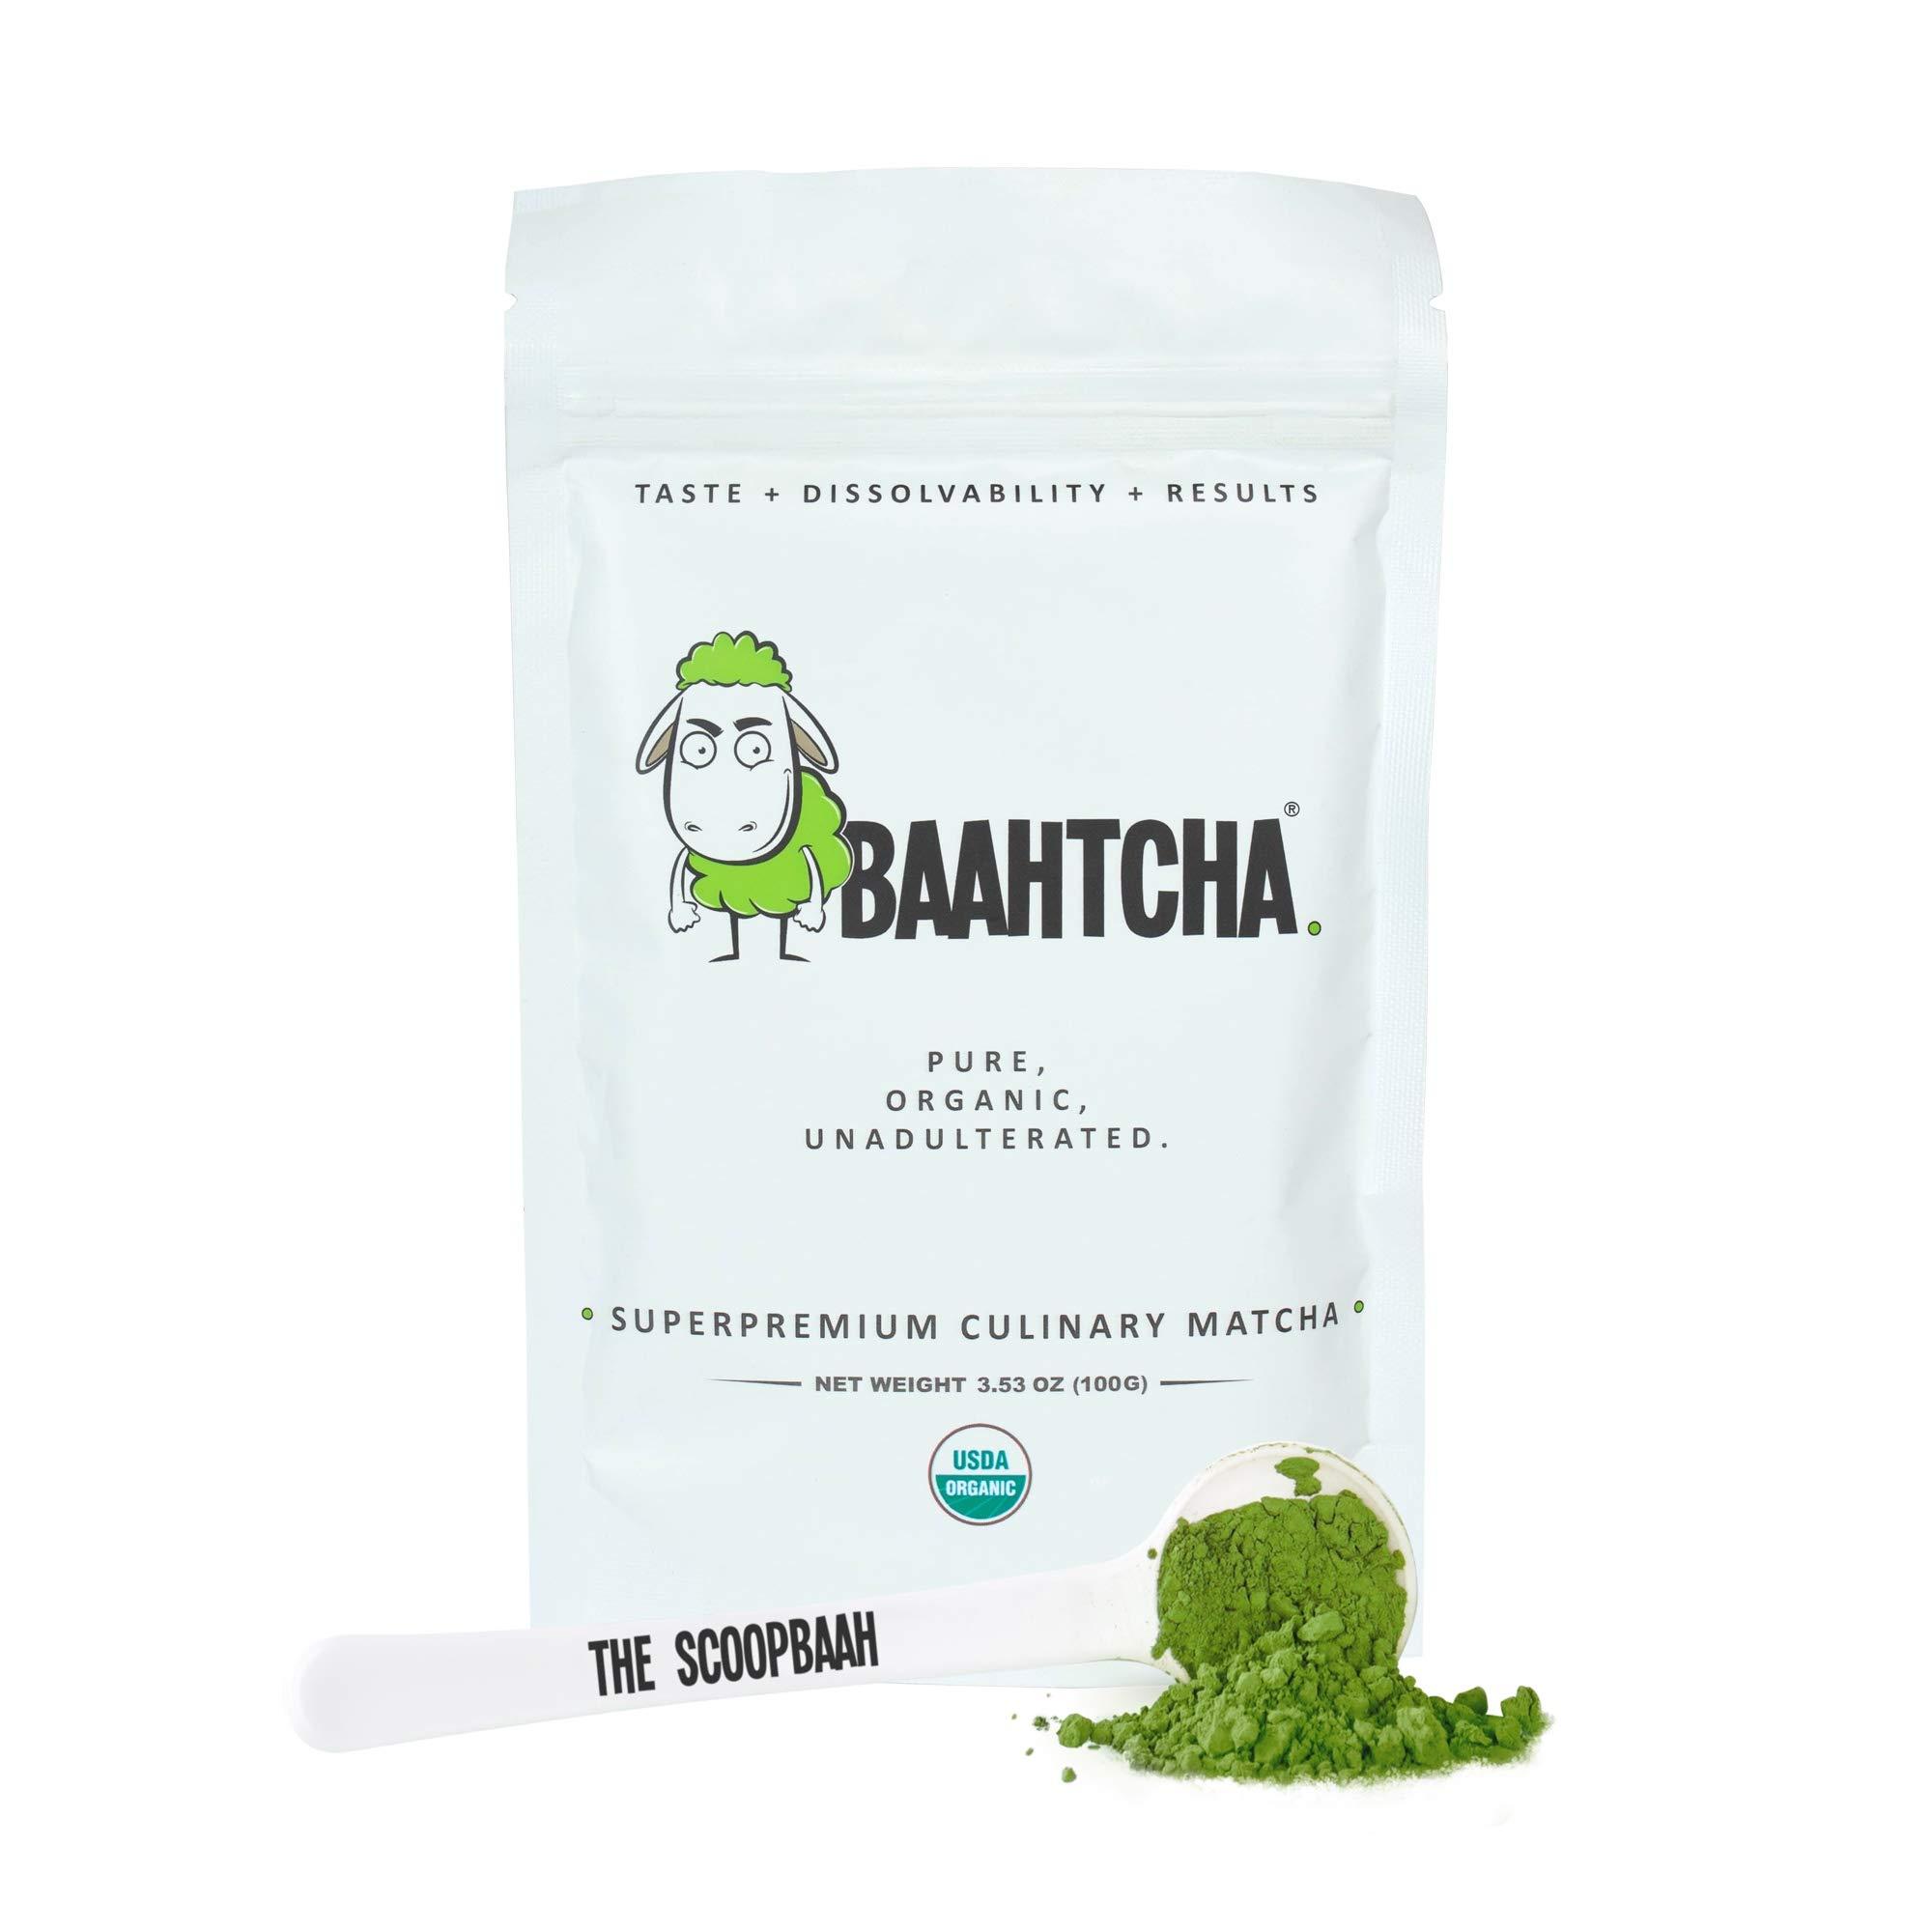 Baahtcha - USDA Organic Matcha Green Tea Powder - Premium Culinary Grade Natural Caffeine Energy Booster, Antioxidant, Weight Loss, Fat Burner - Gluten Free, Vegan - 100g